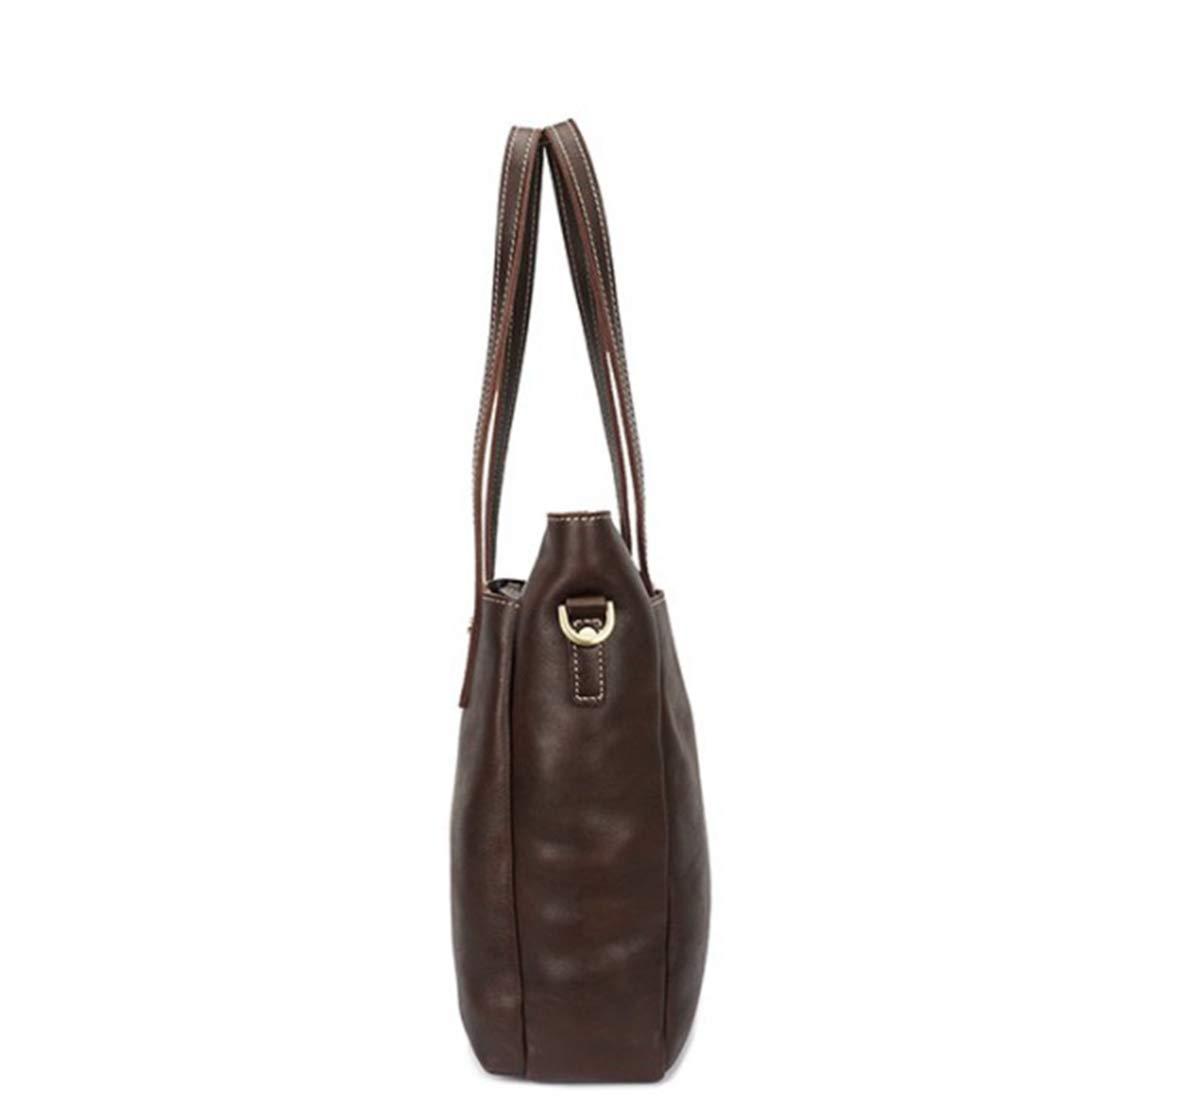 KRPENRIO Mens Messenger Shoulder Bag Vintage Leather Briefcase Crossbody Day Bag for School and Work Color : Coffee Color